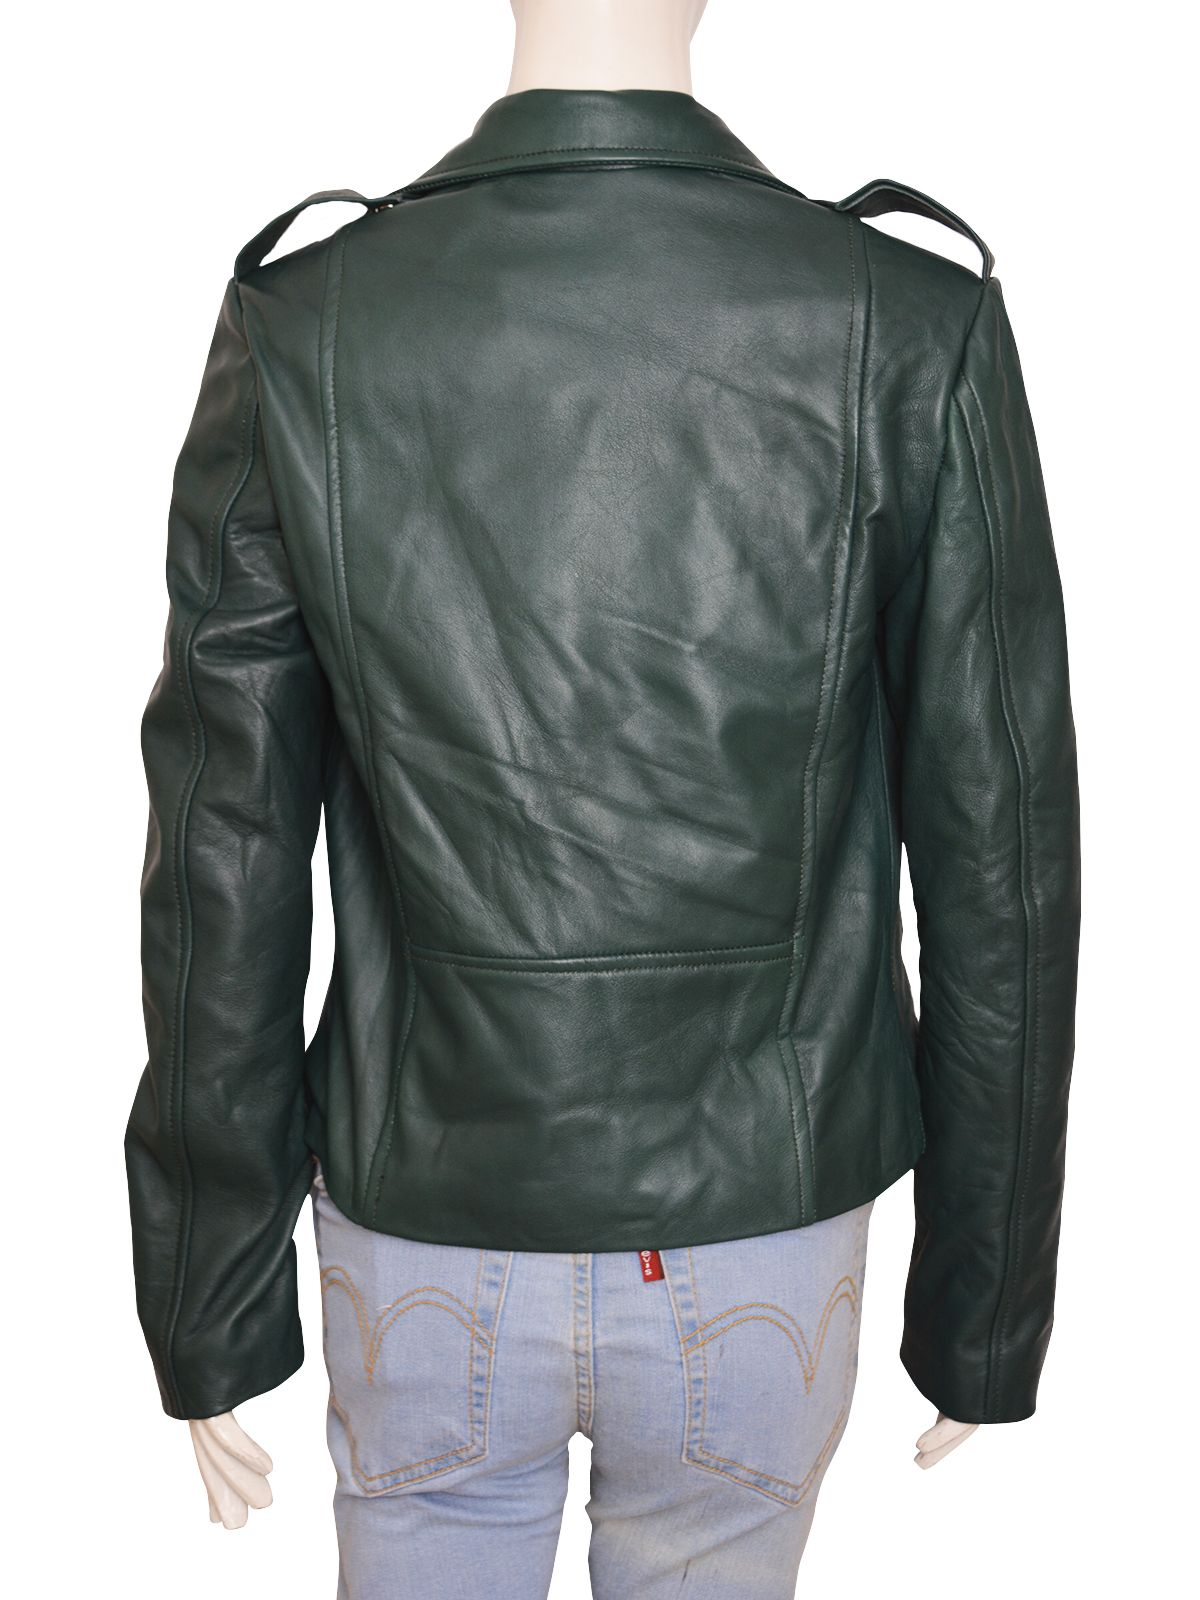 Pine Green Super Cool Leather Jacket Women Jackets